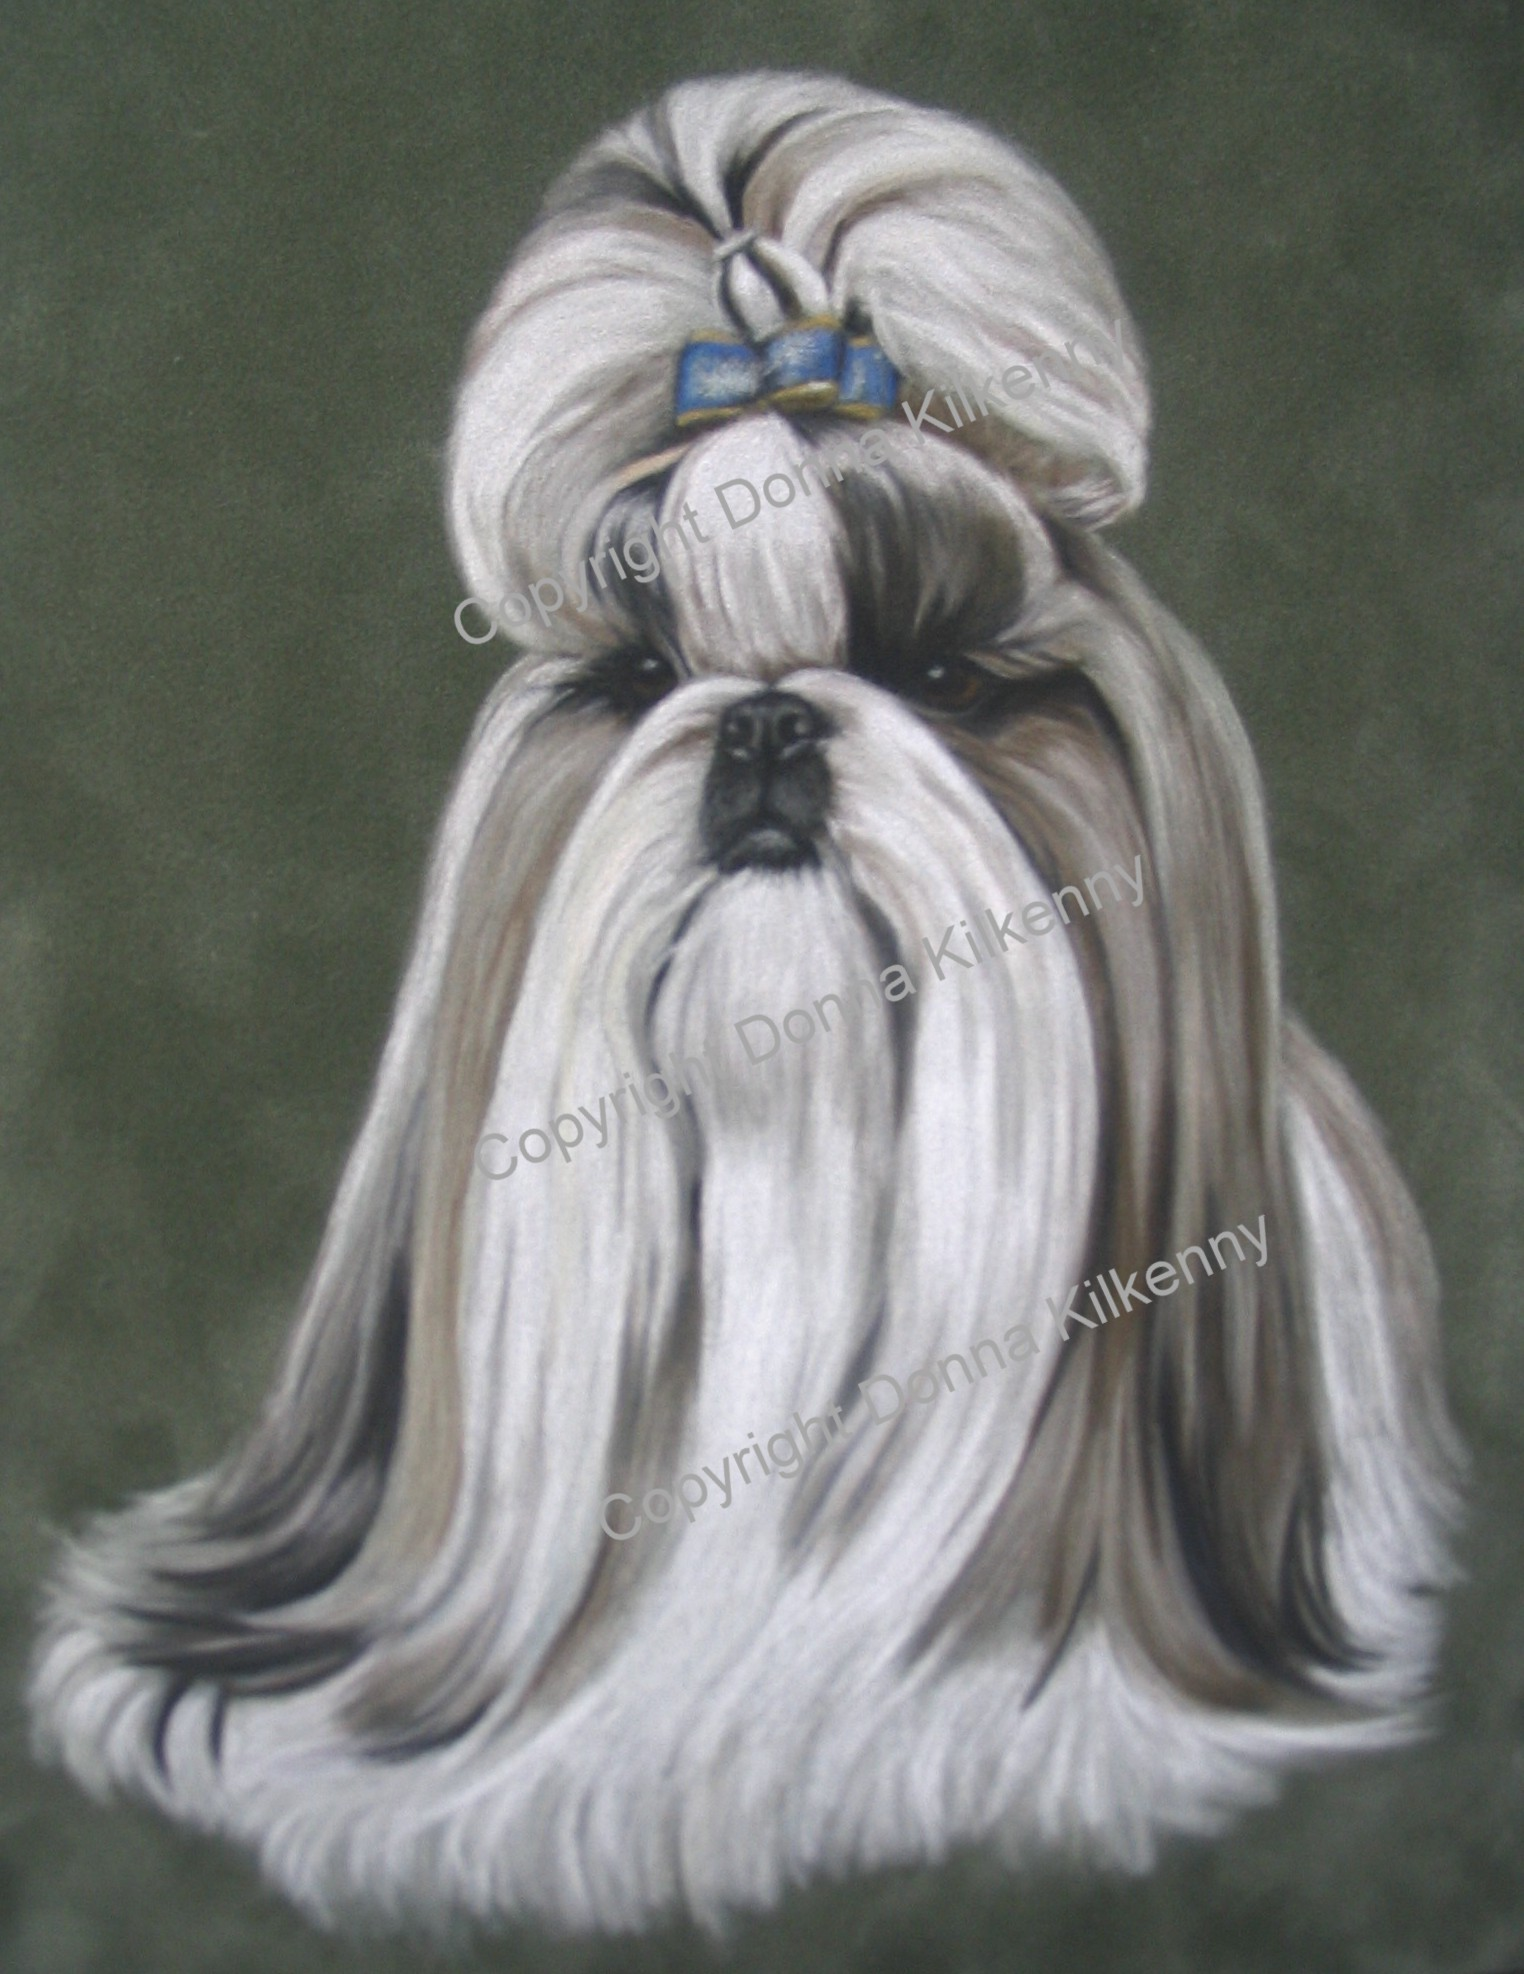 Care-Tzu, Care-Tzus, Cairn Shih-Tzu Hybrid Dogs